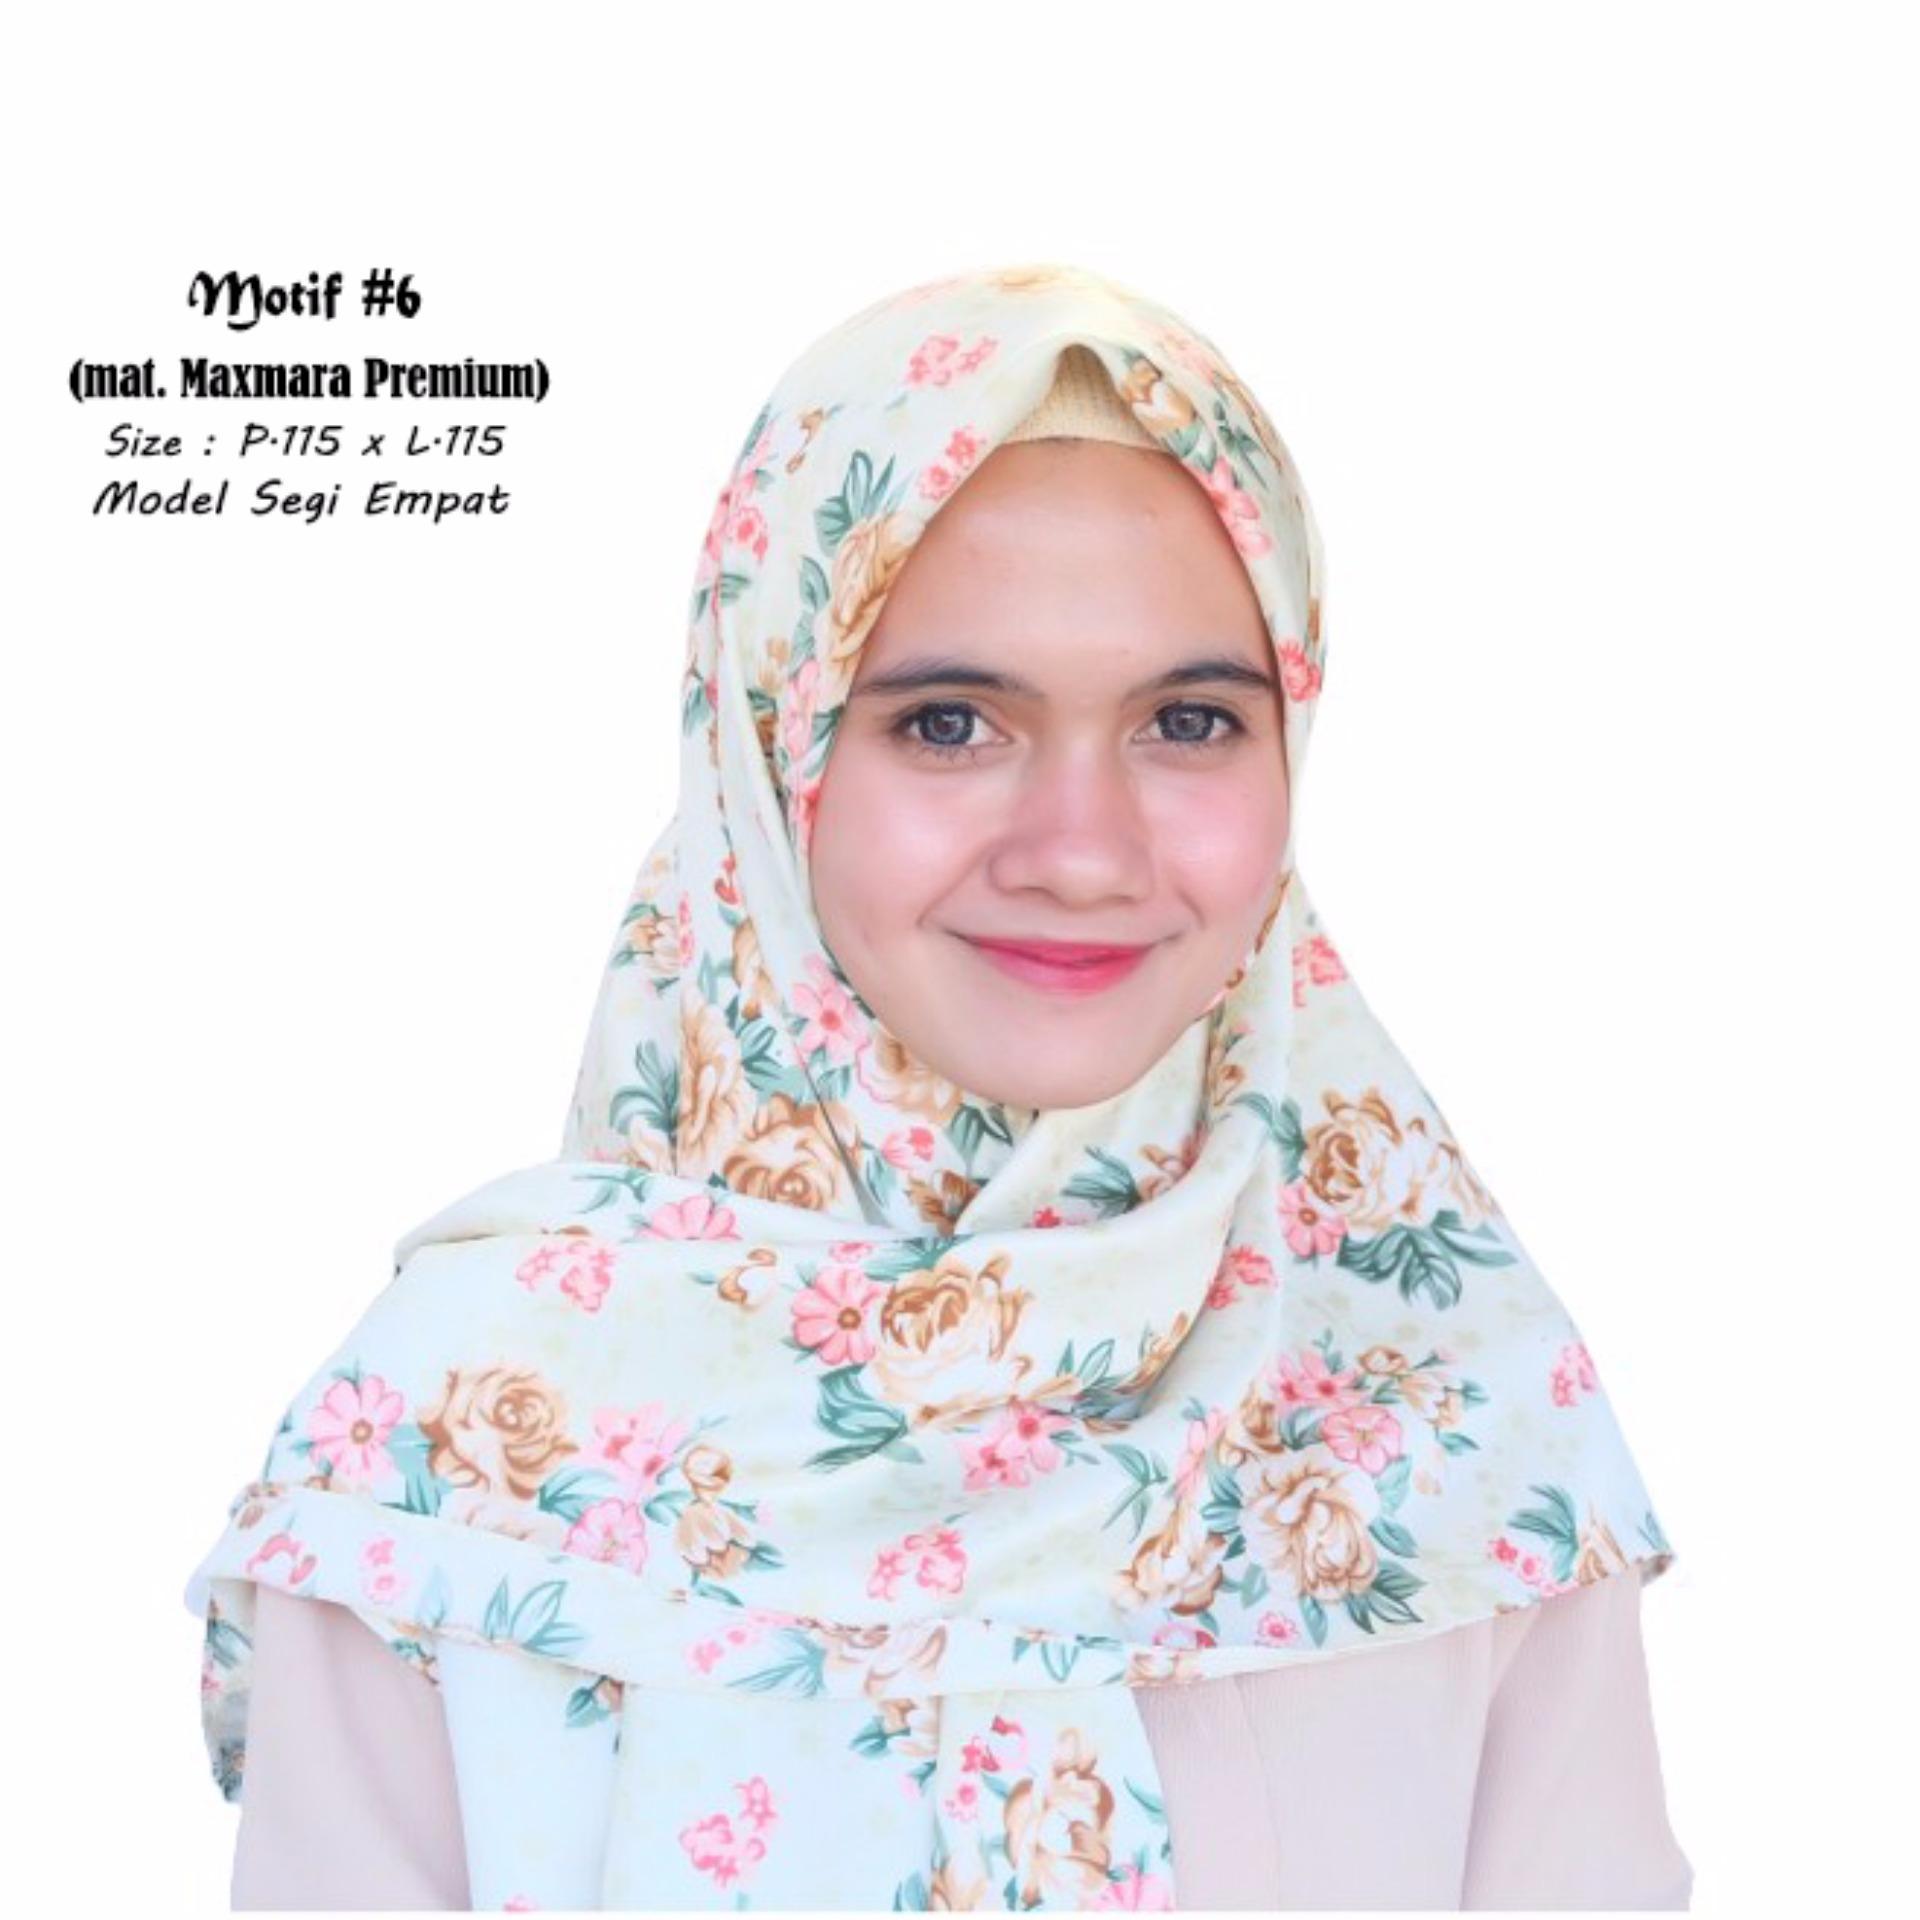 ... GudangGrosir Jilbab Premium Kerudung Segi Empat Motif #6 Hijab Model Floral Printing Bahan Maxmara Warna ...